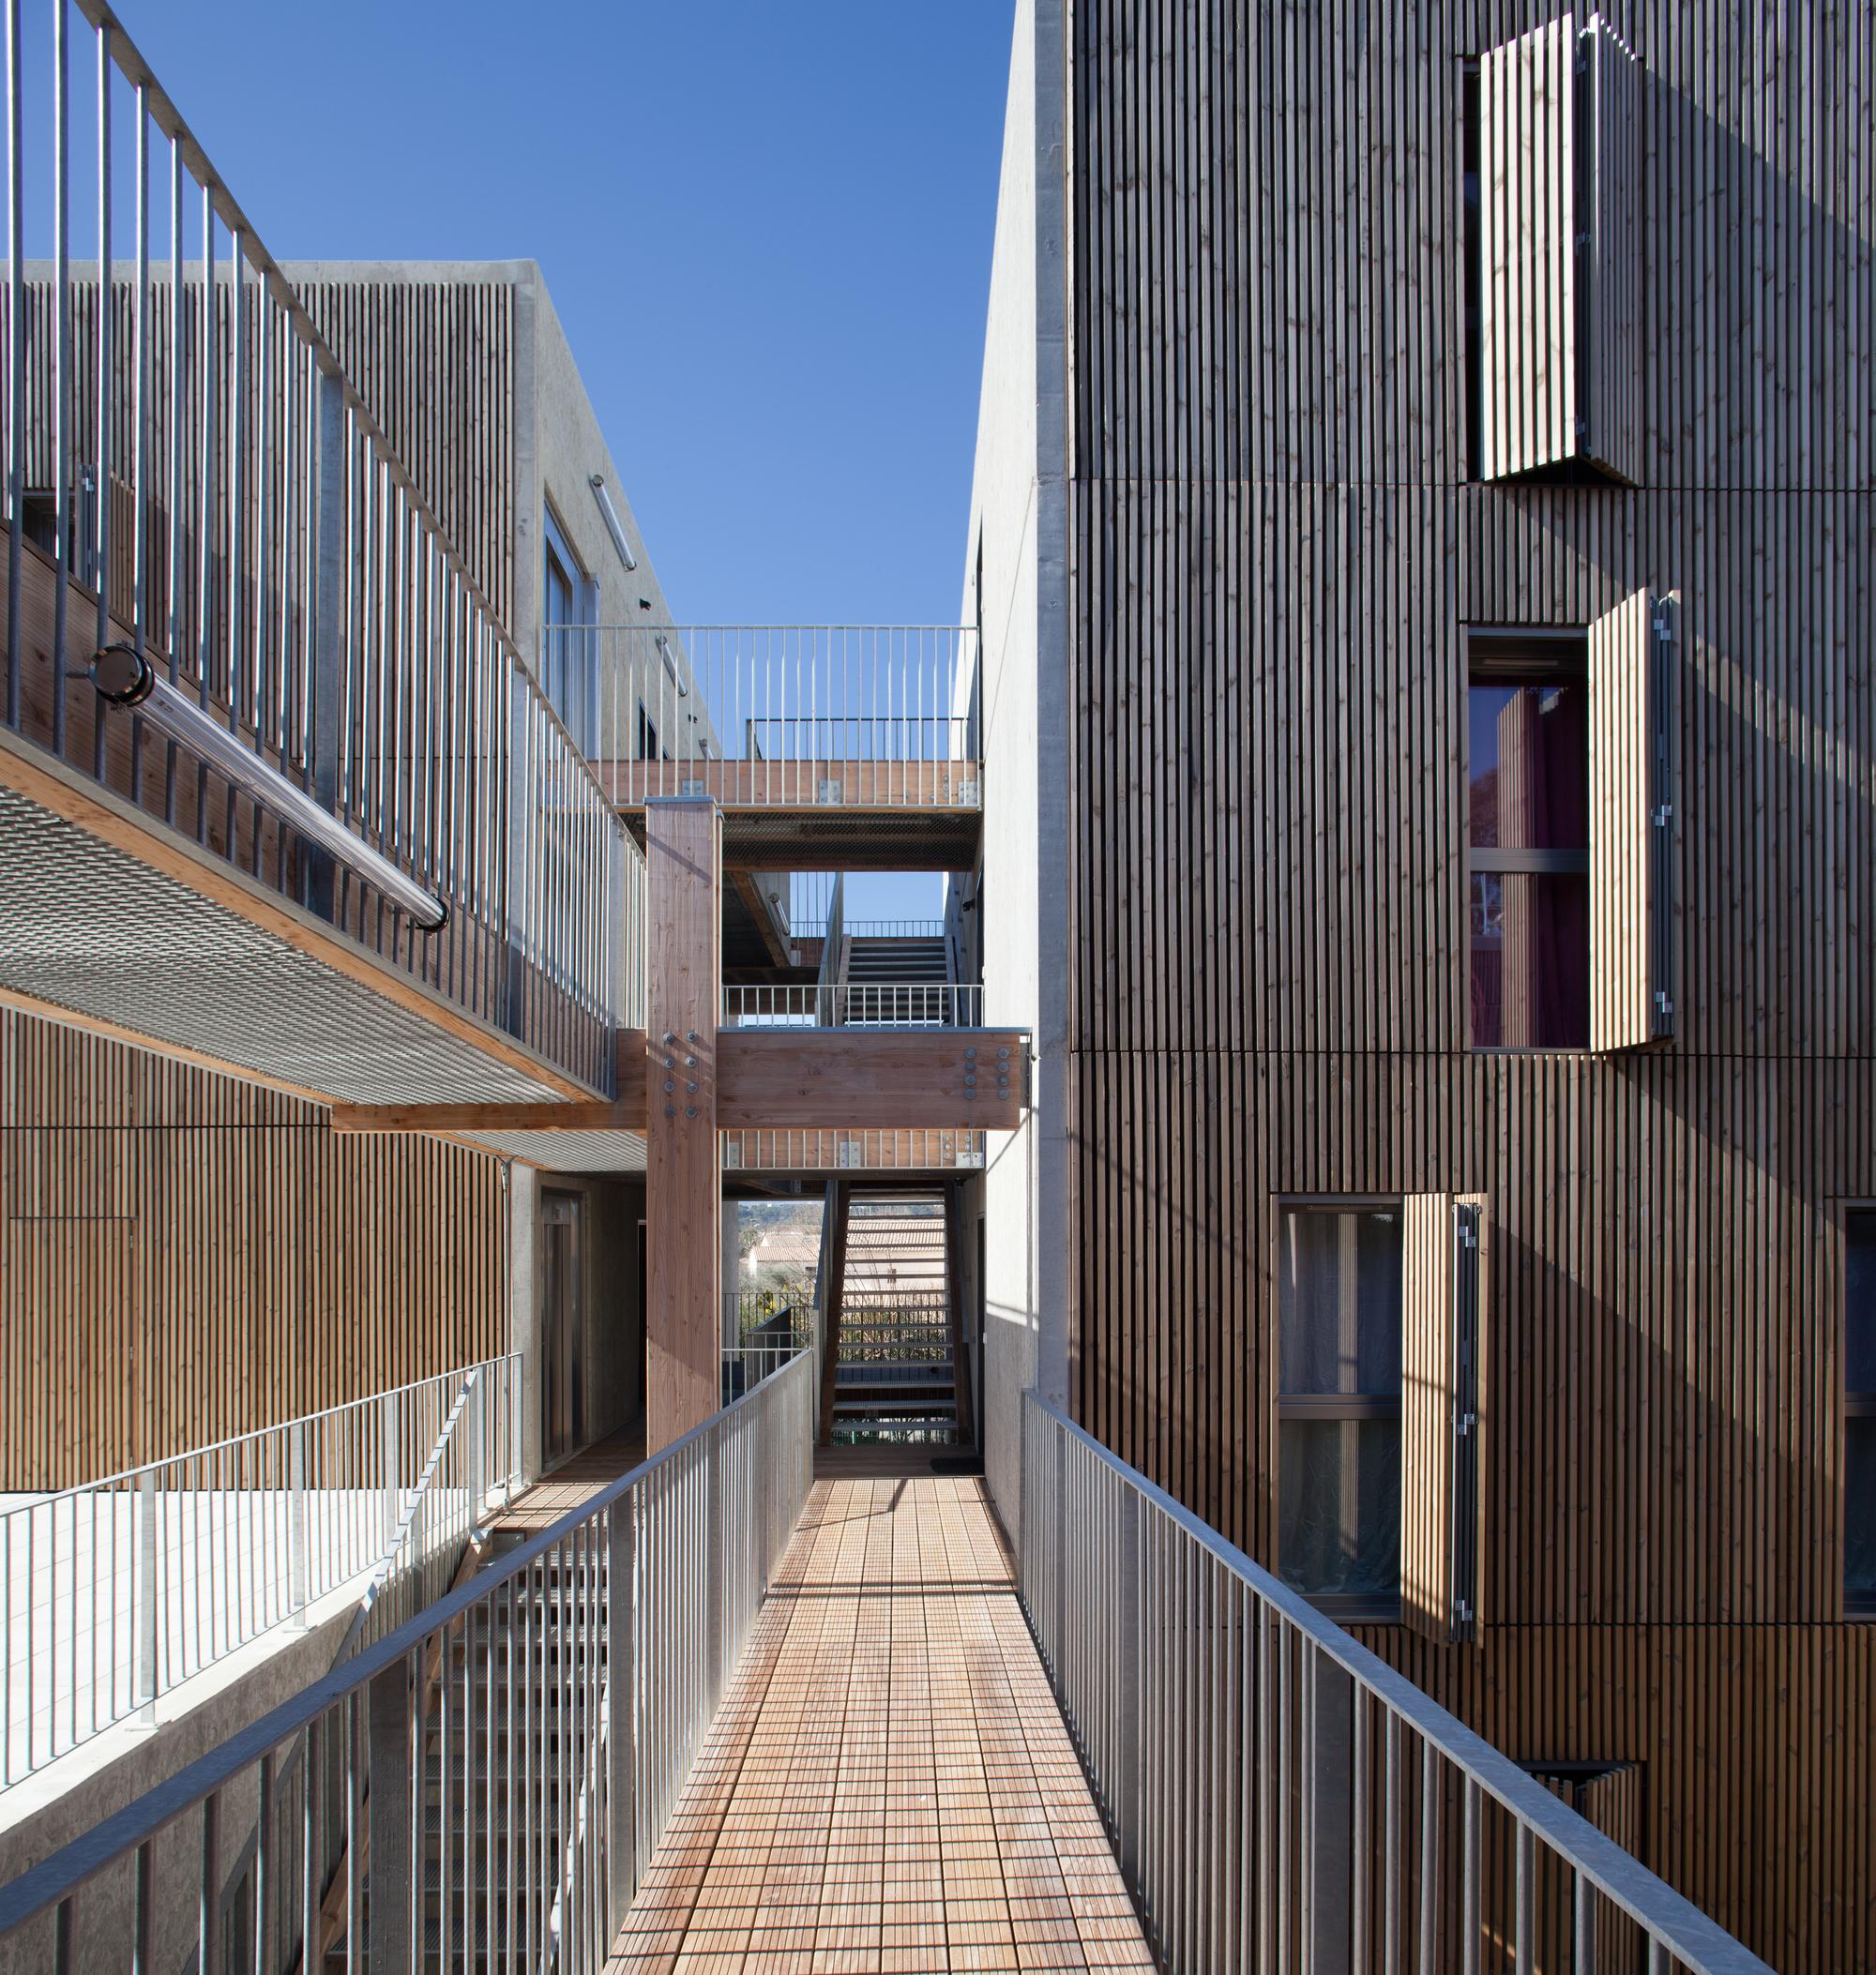 social housing shops in mouans sartoux comte et vollenweider architectes archdaily. Black Bedroom Furniture Sets. Home Design Ideas